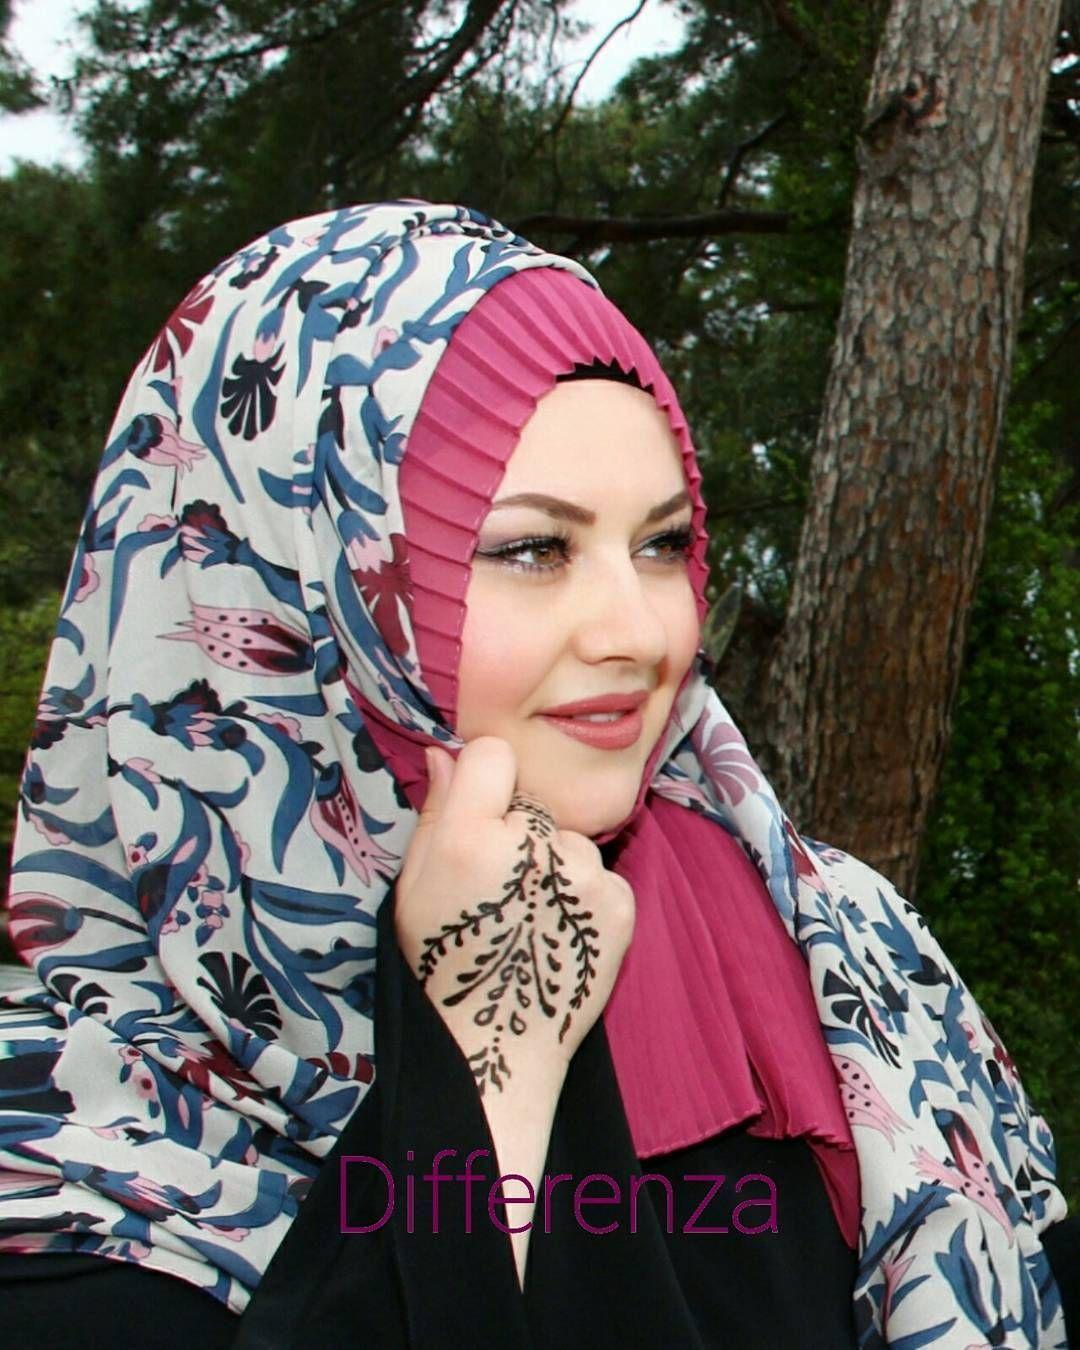 Image May Contain 1 Person Guzel Turban Desenler Resim